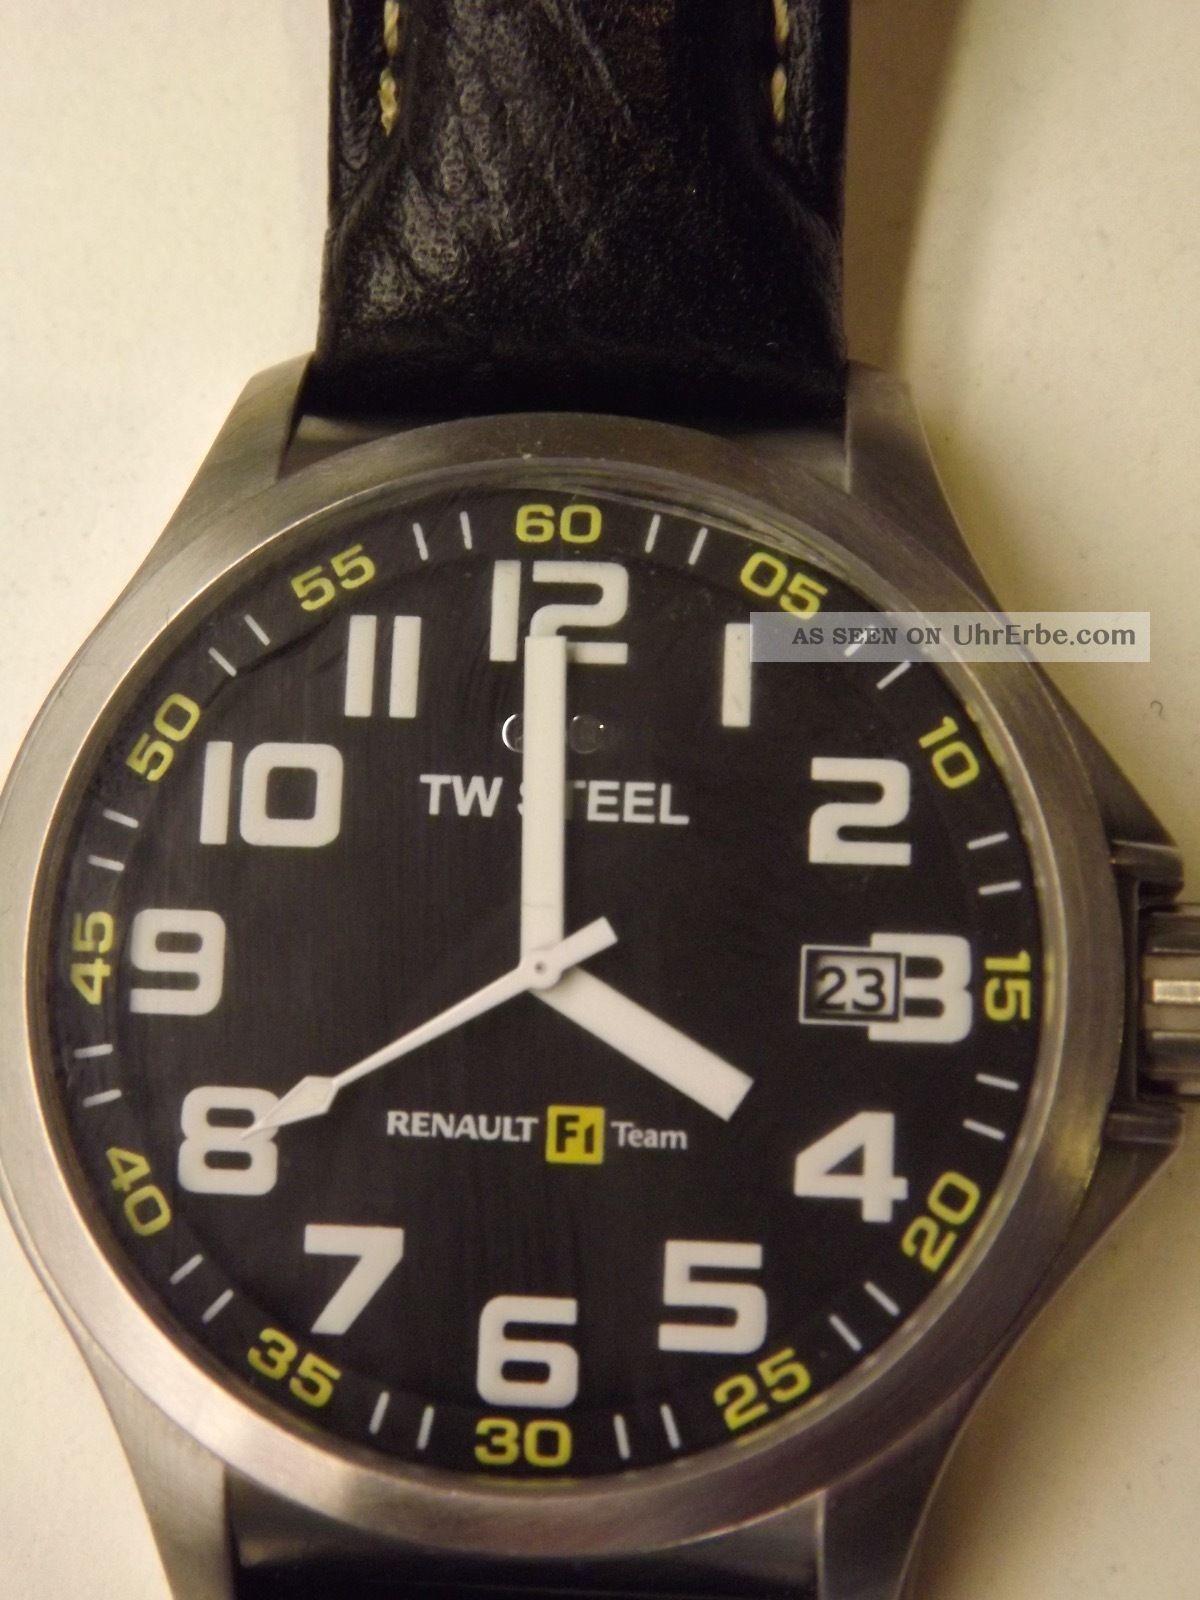 Tw Steel Pilot Renault F1 Team Armbanduhr Für Herren (tw670) Armbanduhren Bild